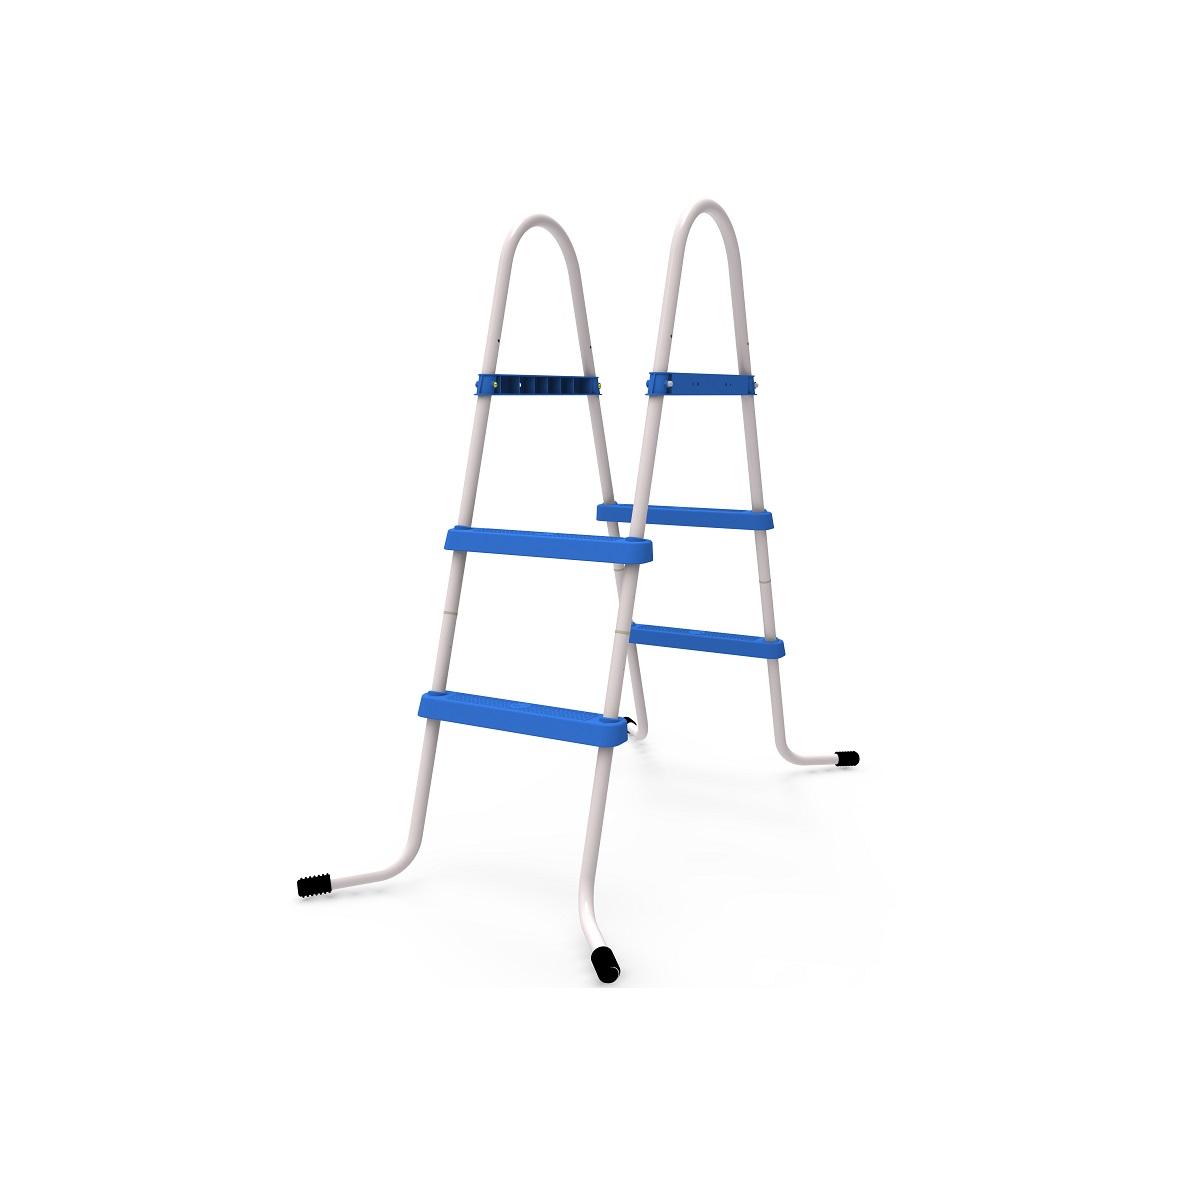 MASTER - schůdky do bazénu s výškou 84 cm